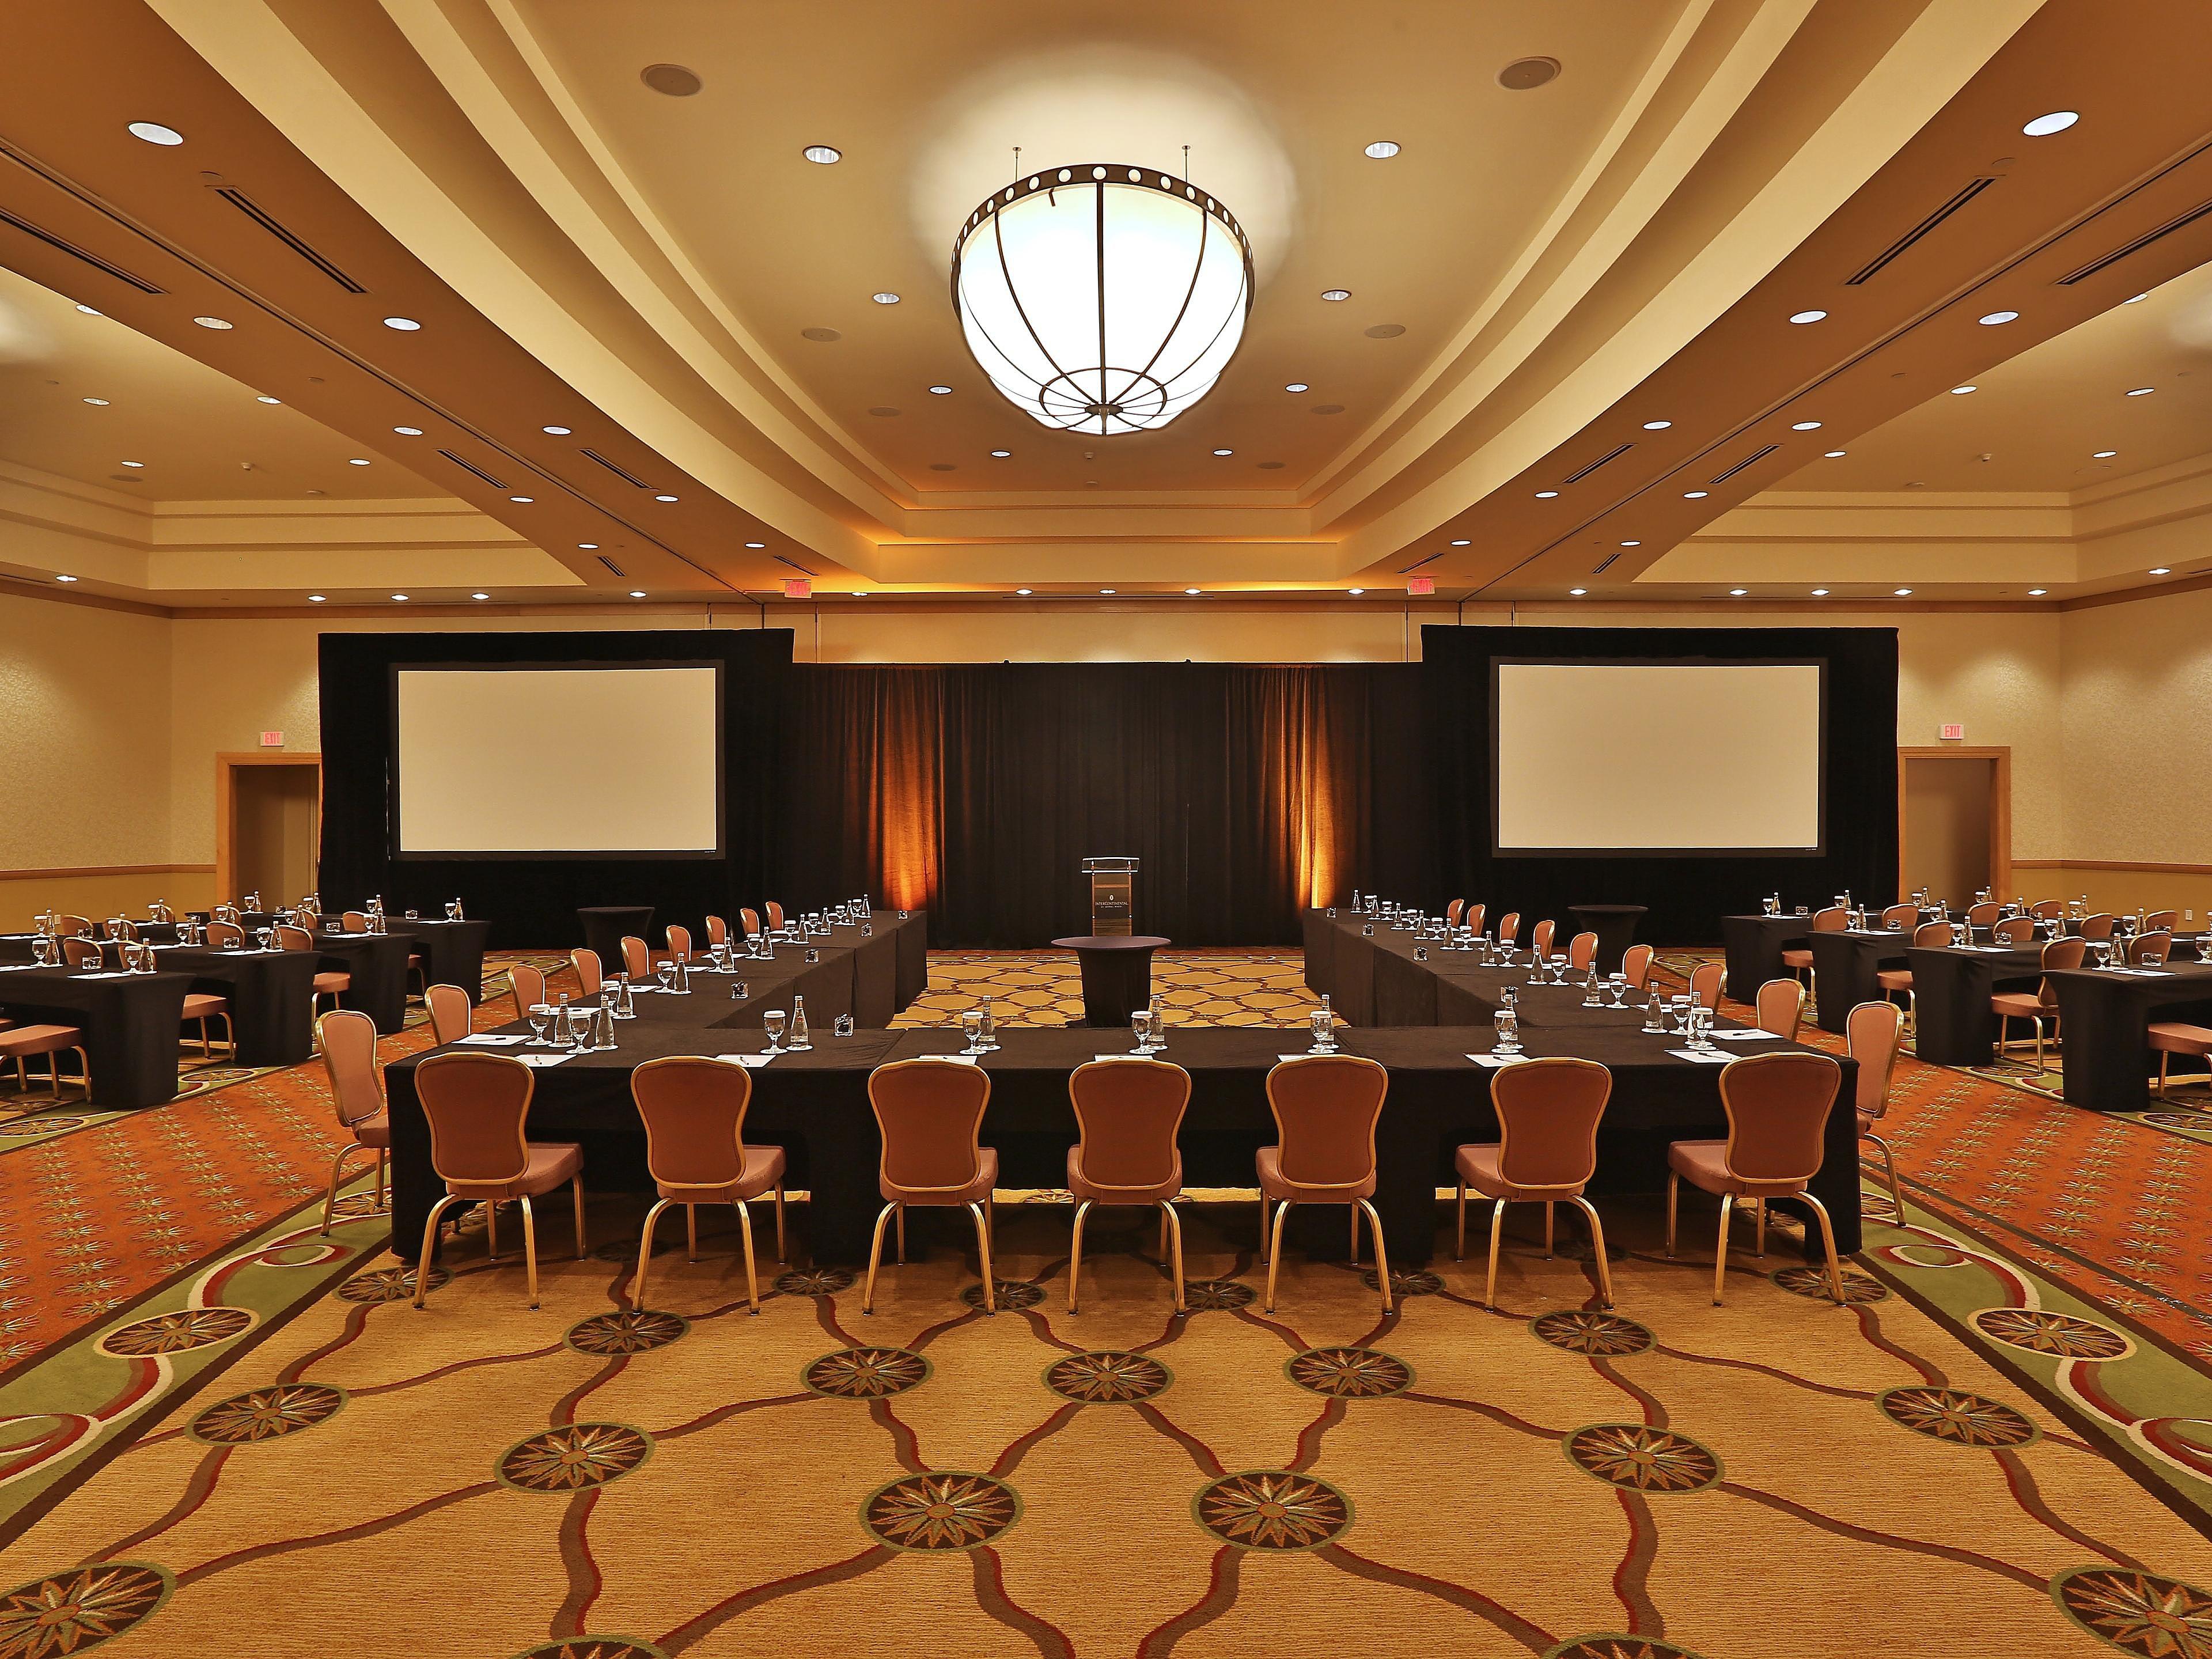 Luxury Hotels in Doral, FL   InterContinental At Doral Miami